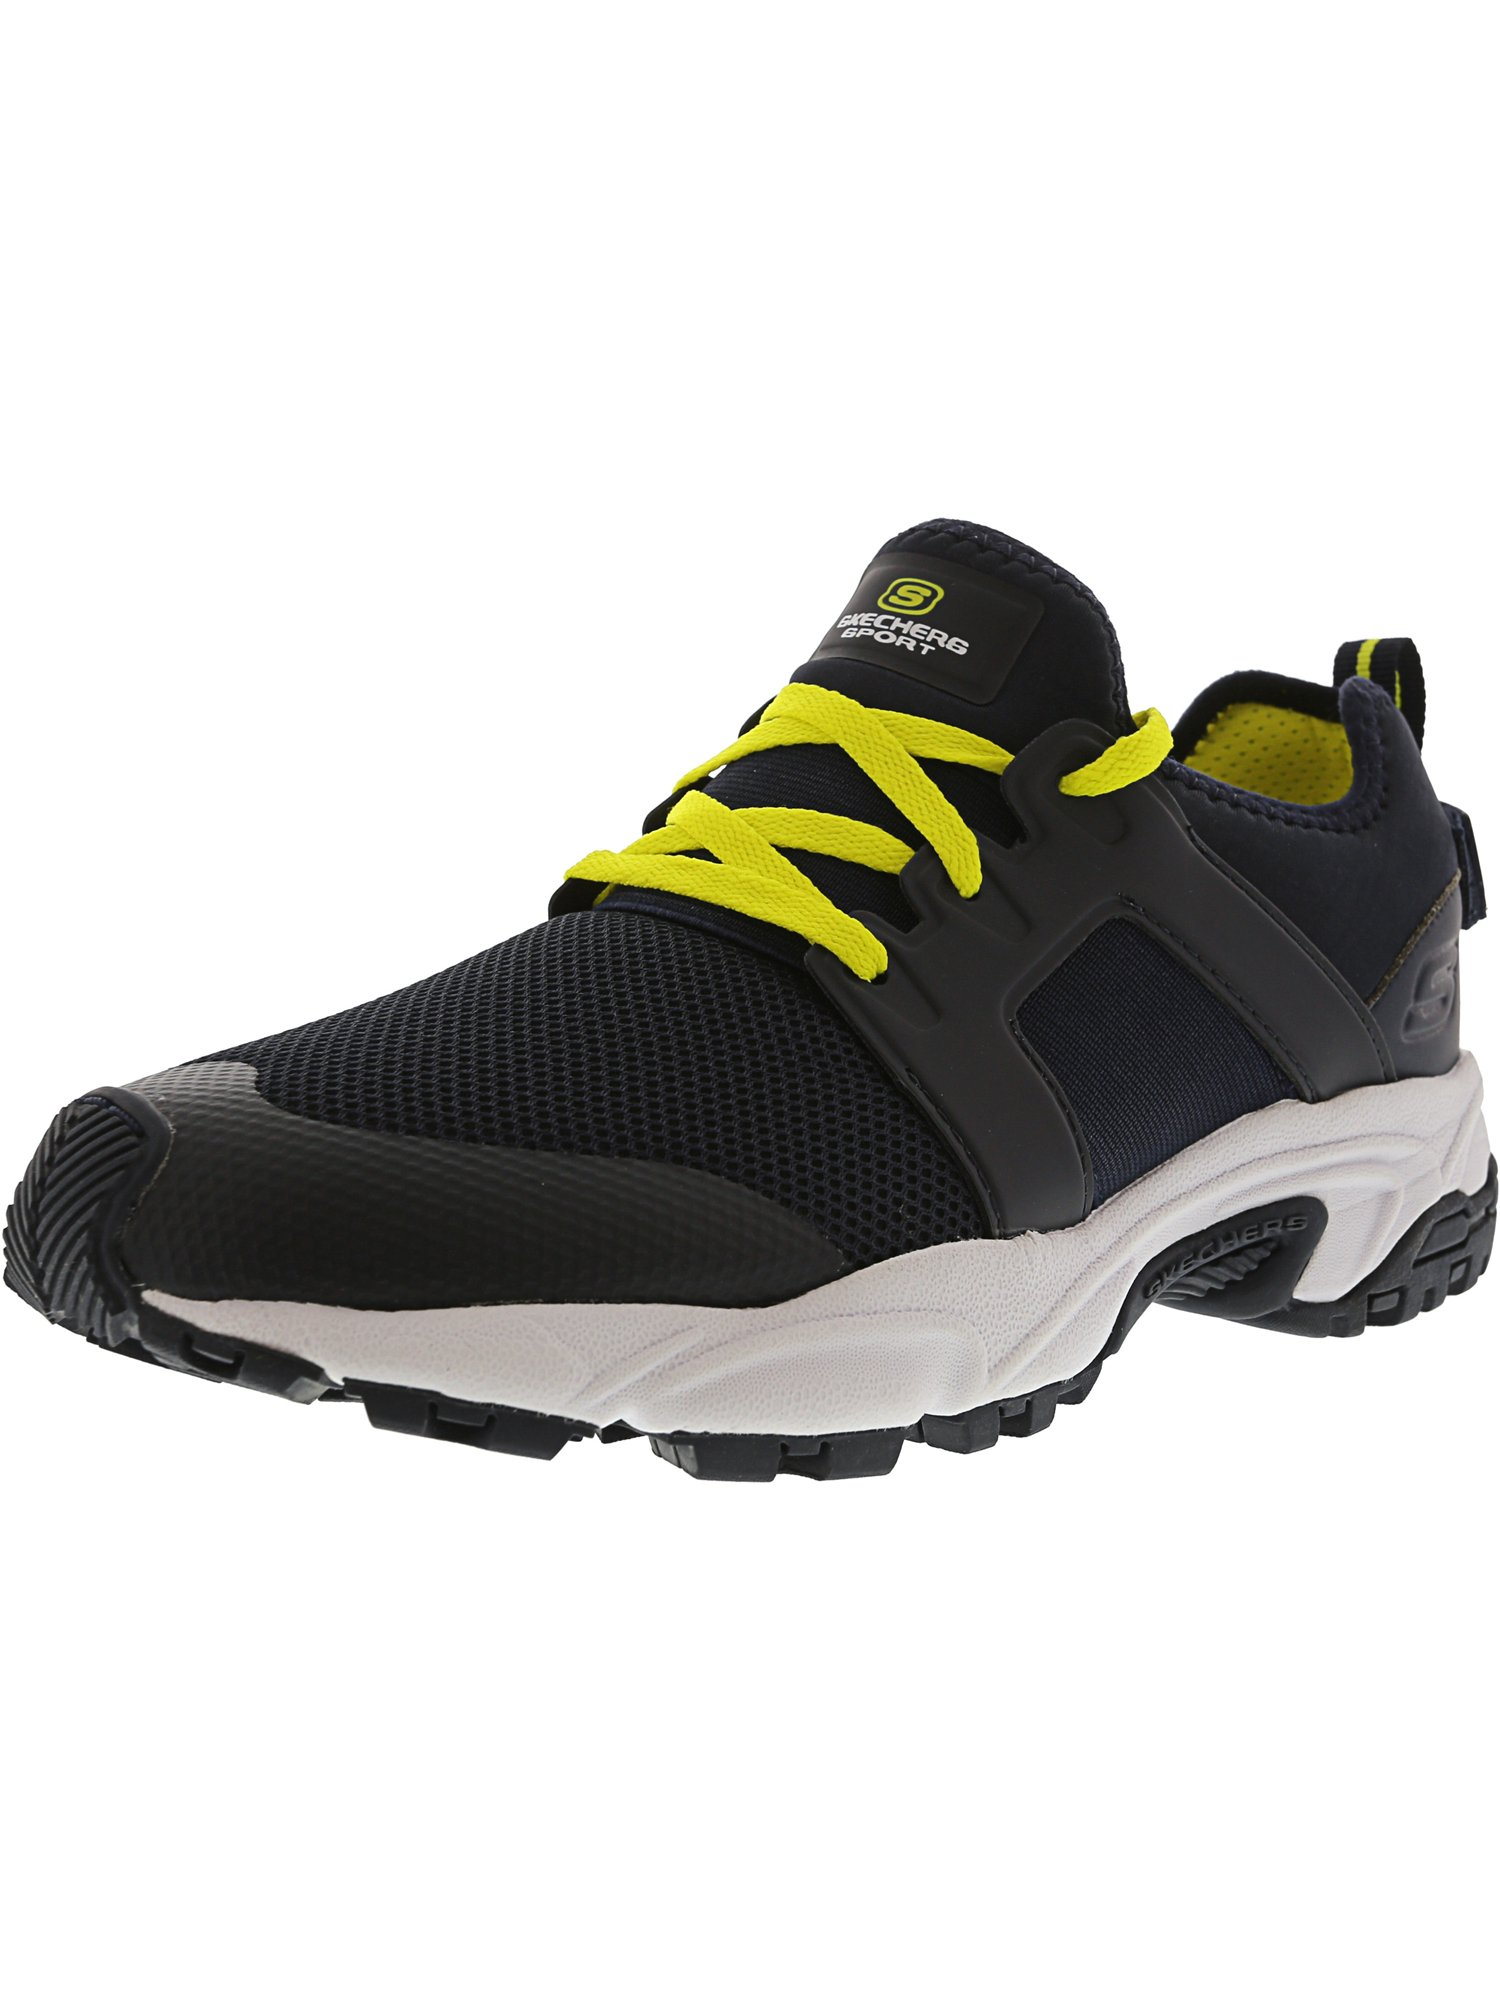 Men's Stamina - Dracfort Training Shoe